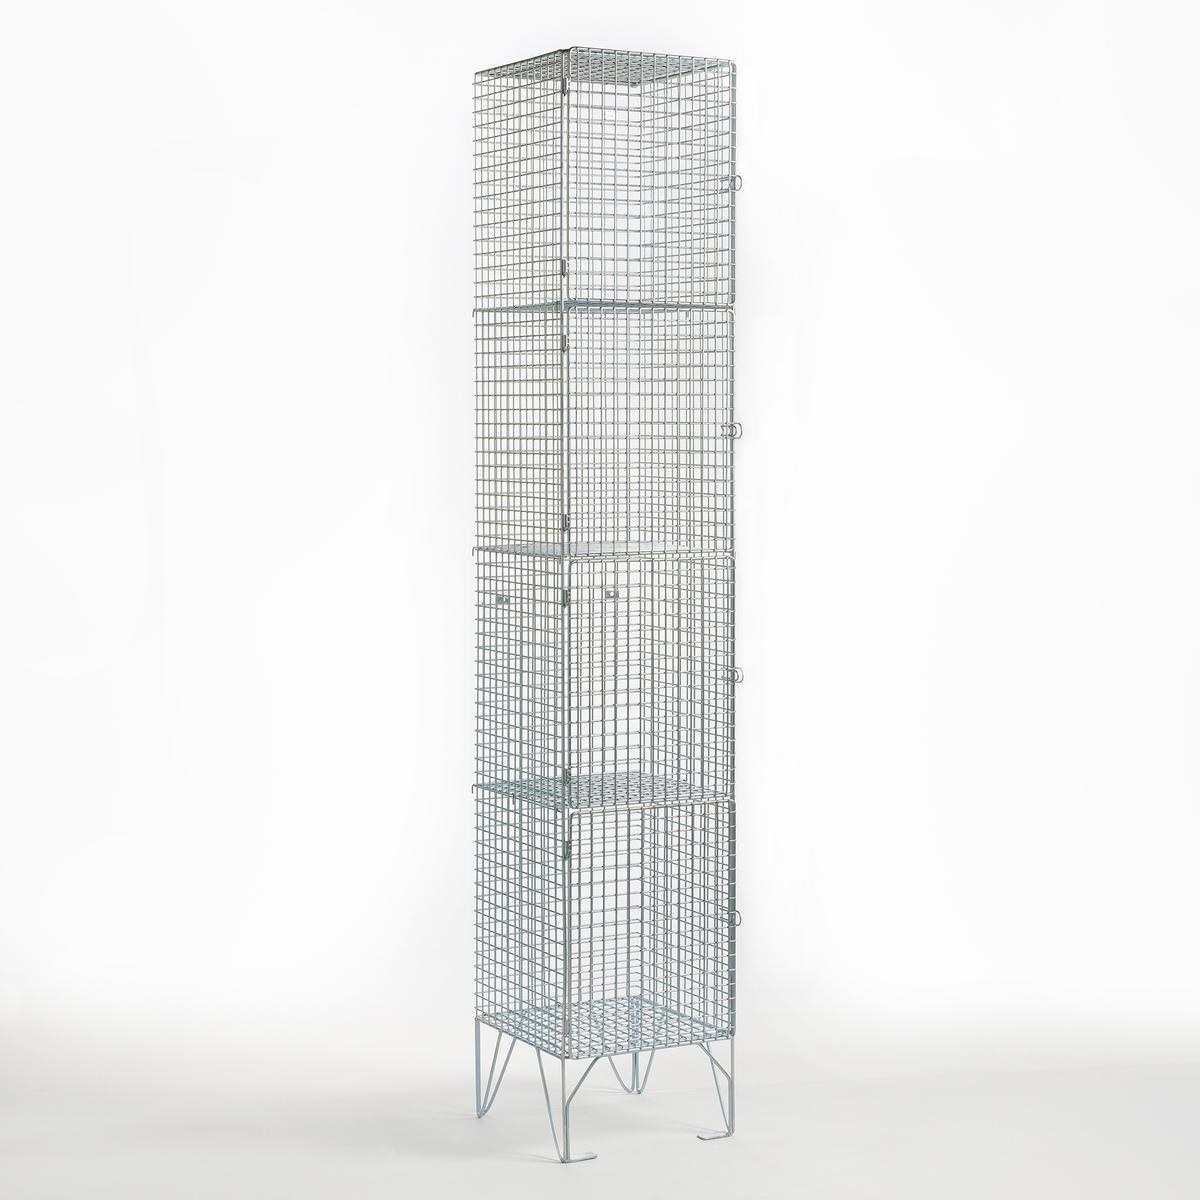 Этажерка Montozon вешалка этажерка из металлической проволоки aréglo